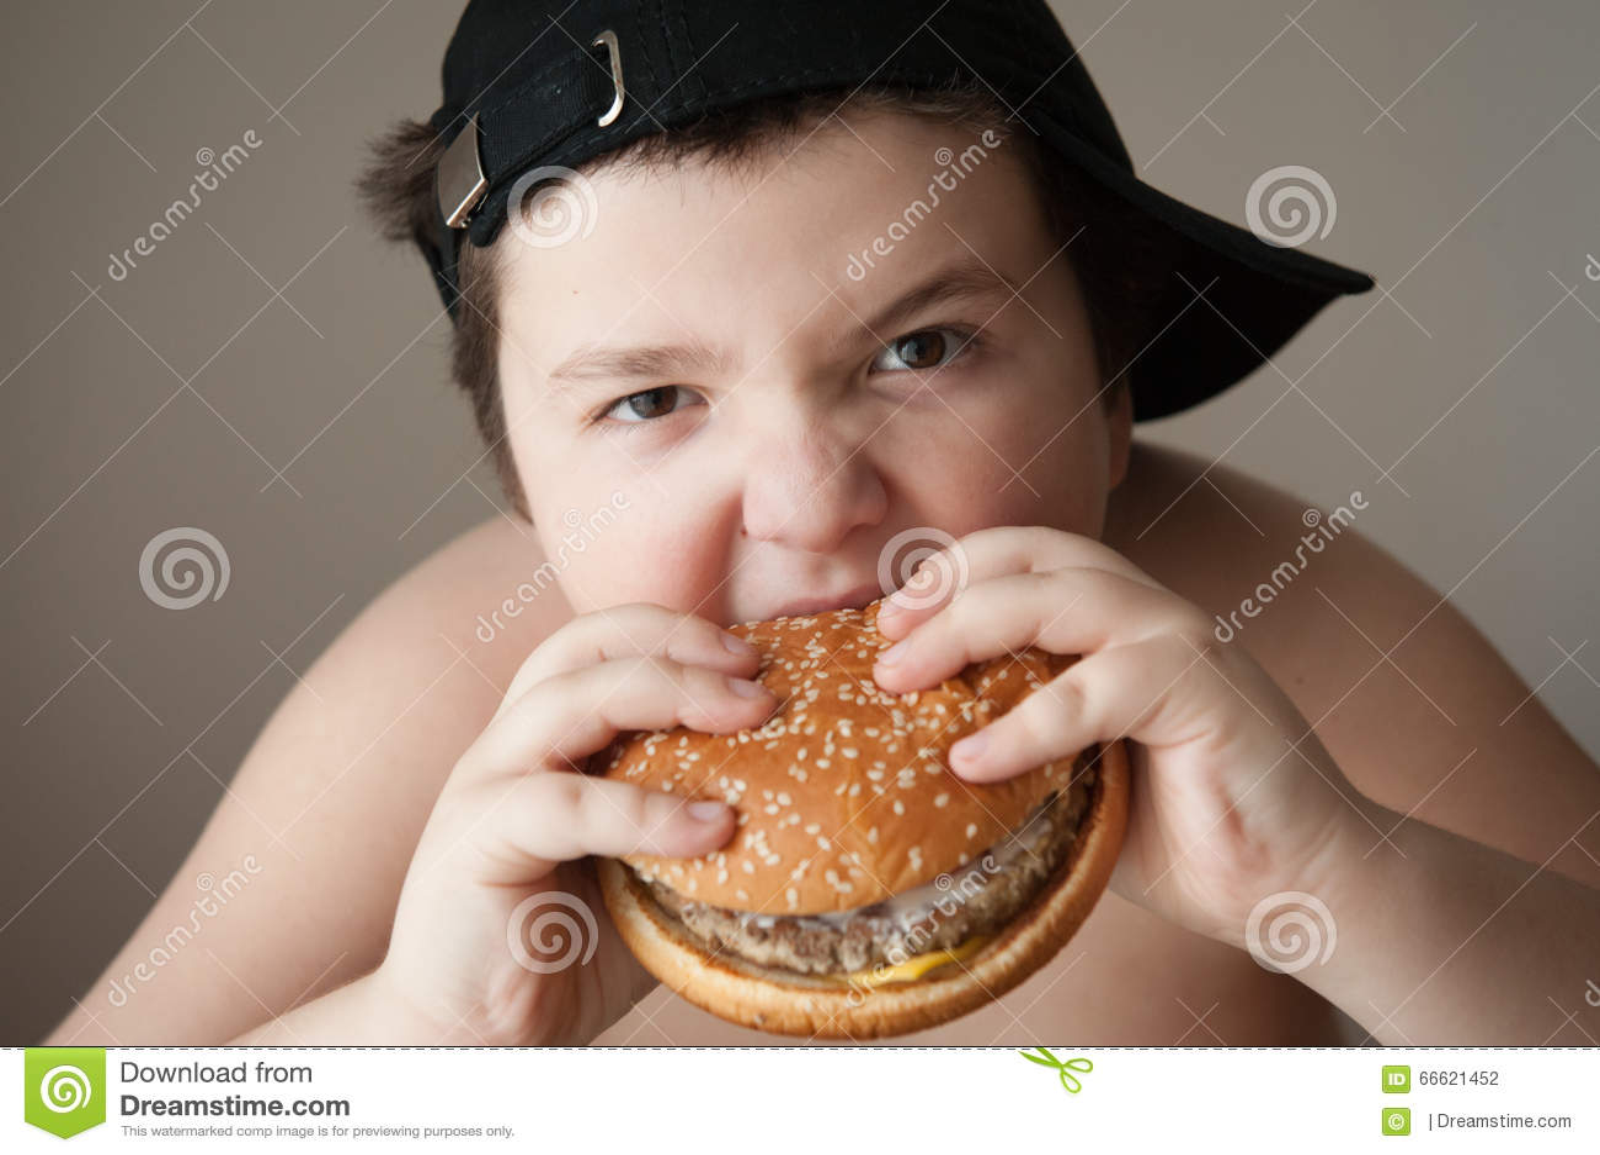 hight resolution of fat boy in cap eats a hamburger